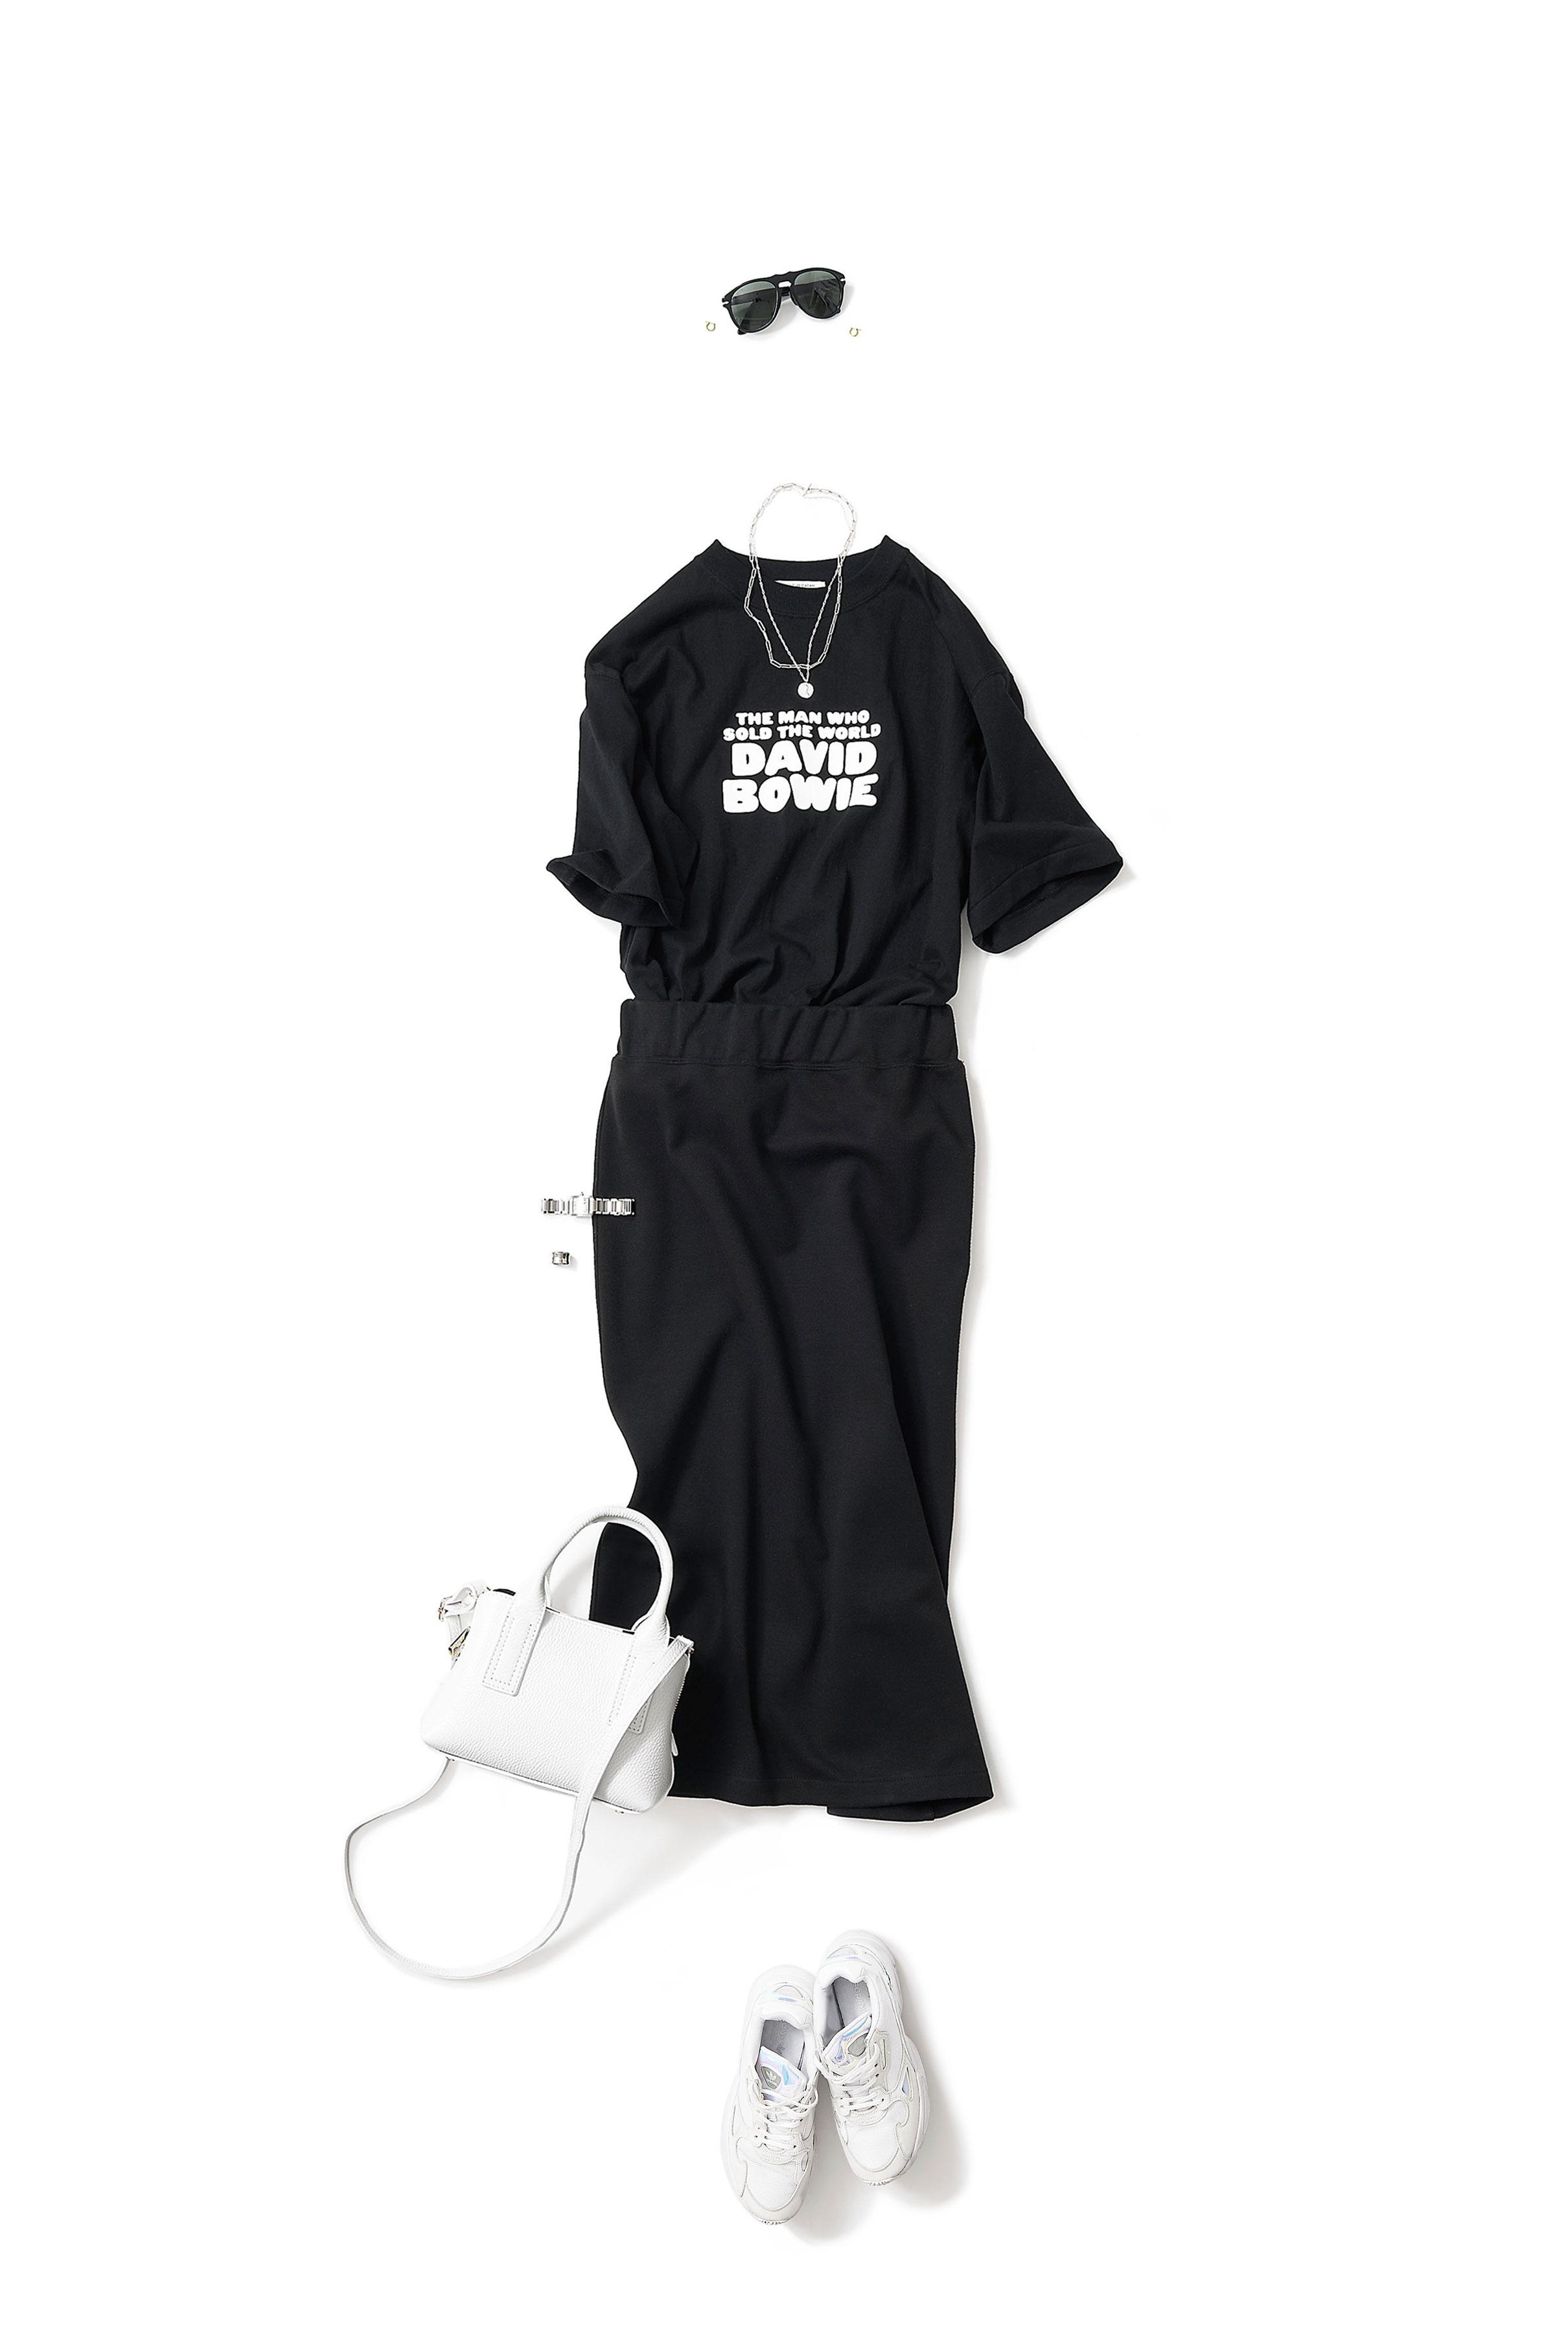 Tシャツ×タイトスカート・part 2